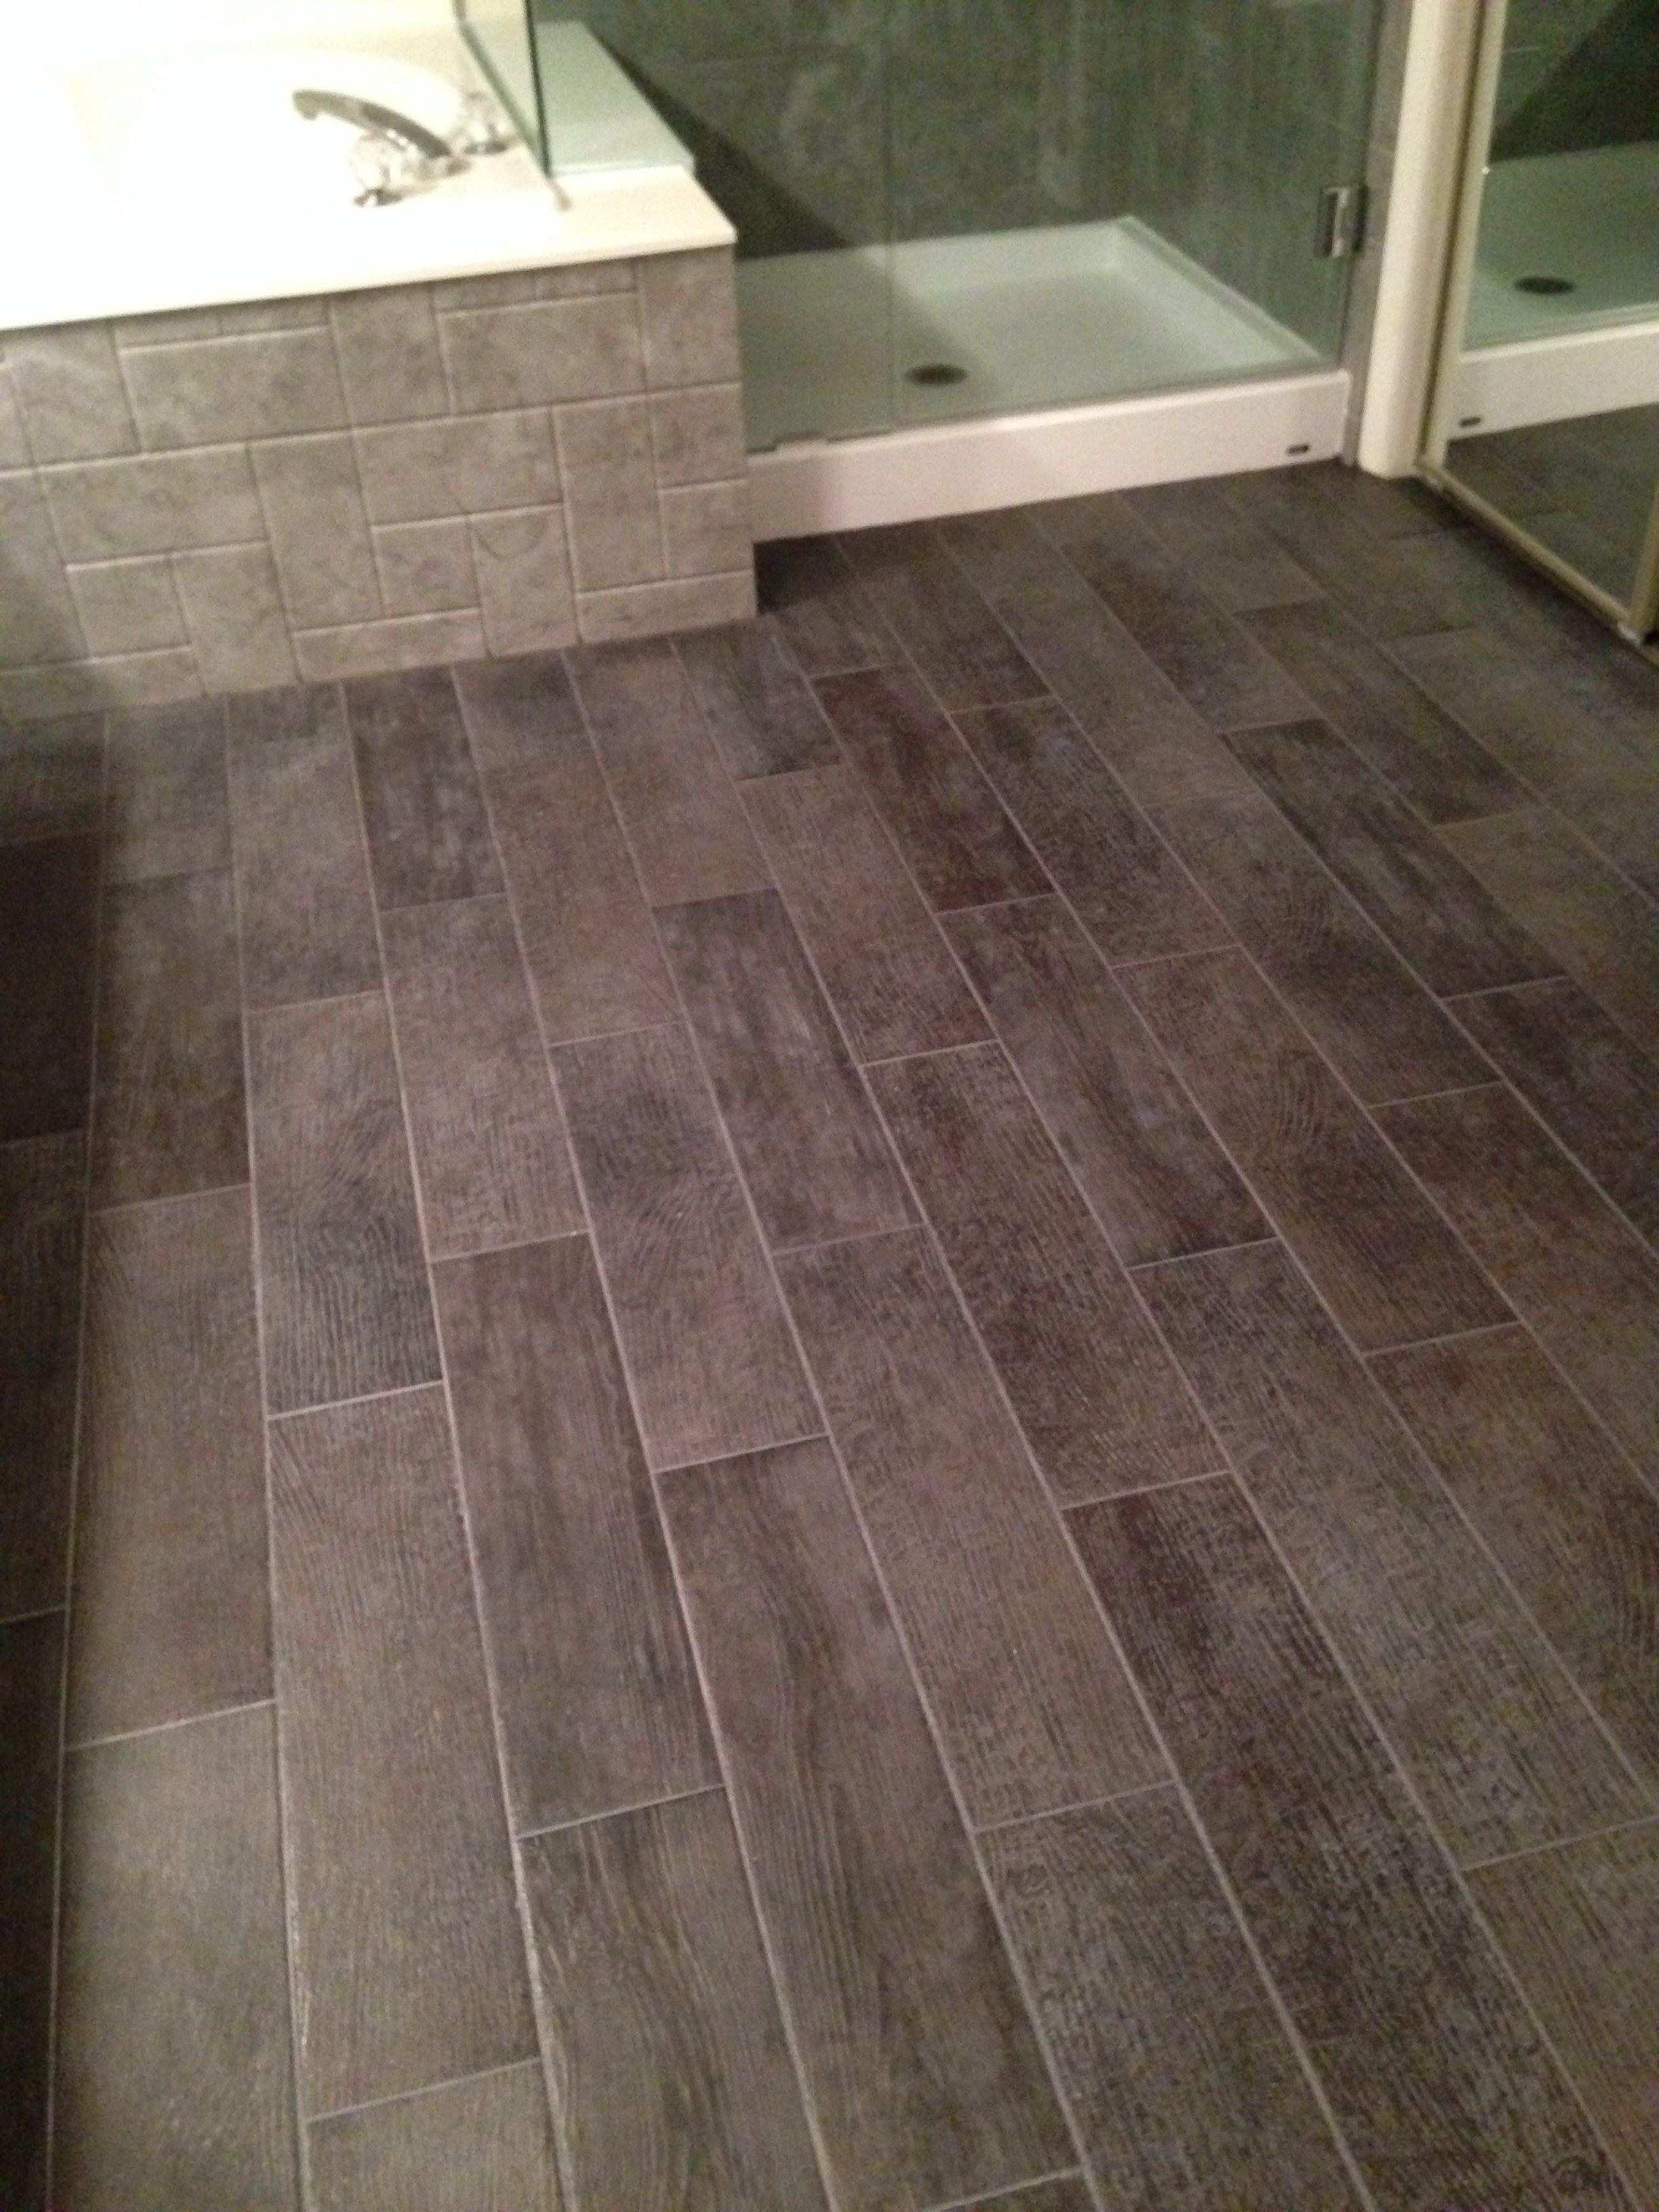 Bathroom Floor 6x24 Tiles Charcoal Gray Look Like Wood Love It